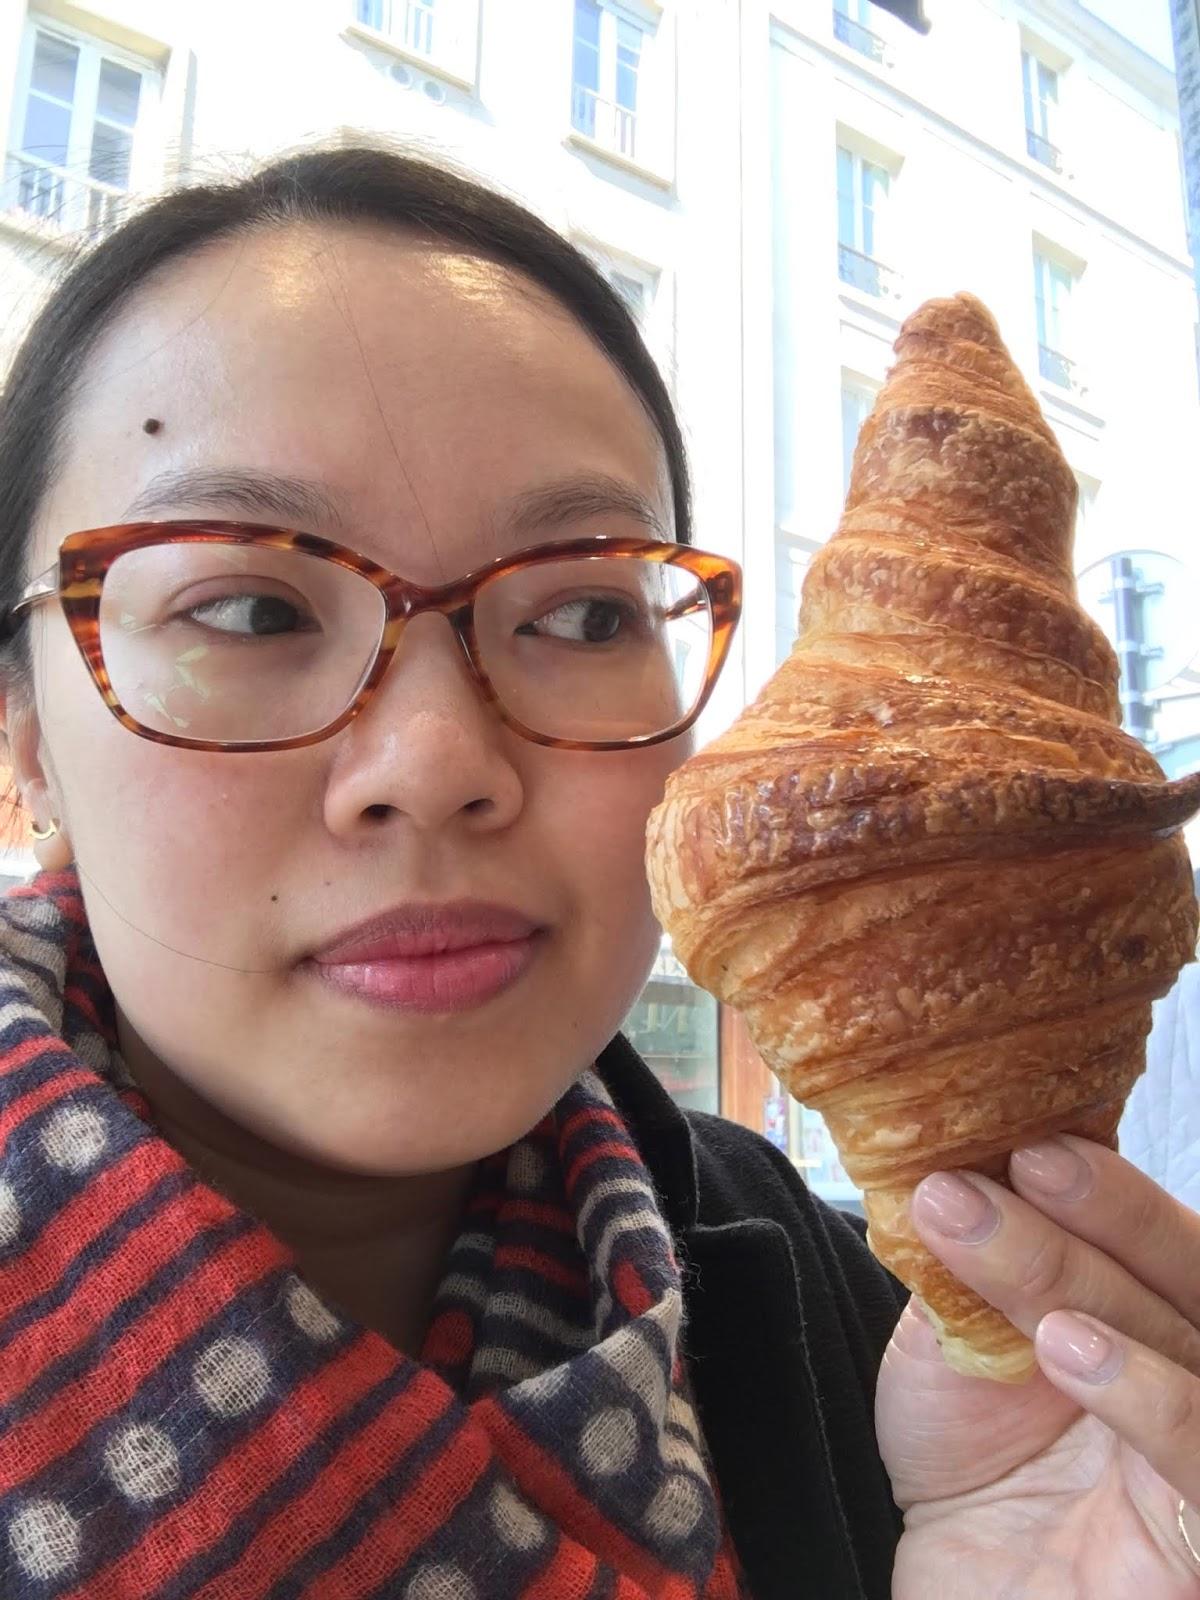 Holding up a giant Parisian croissant